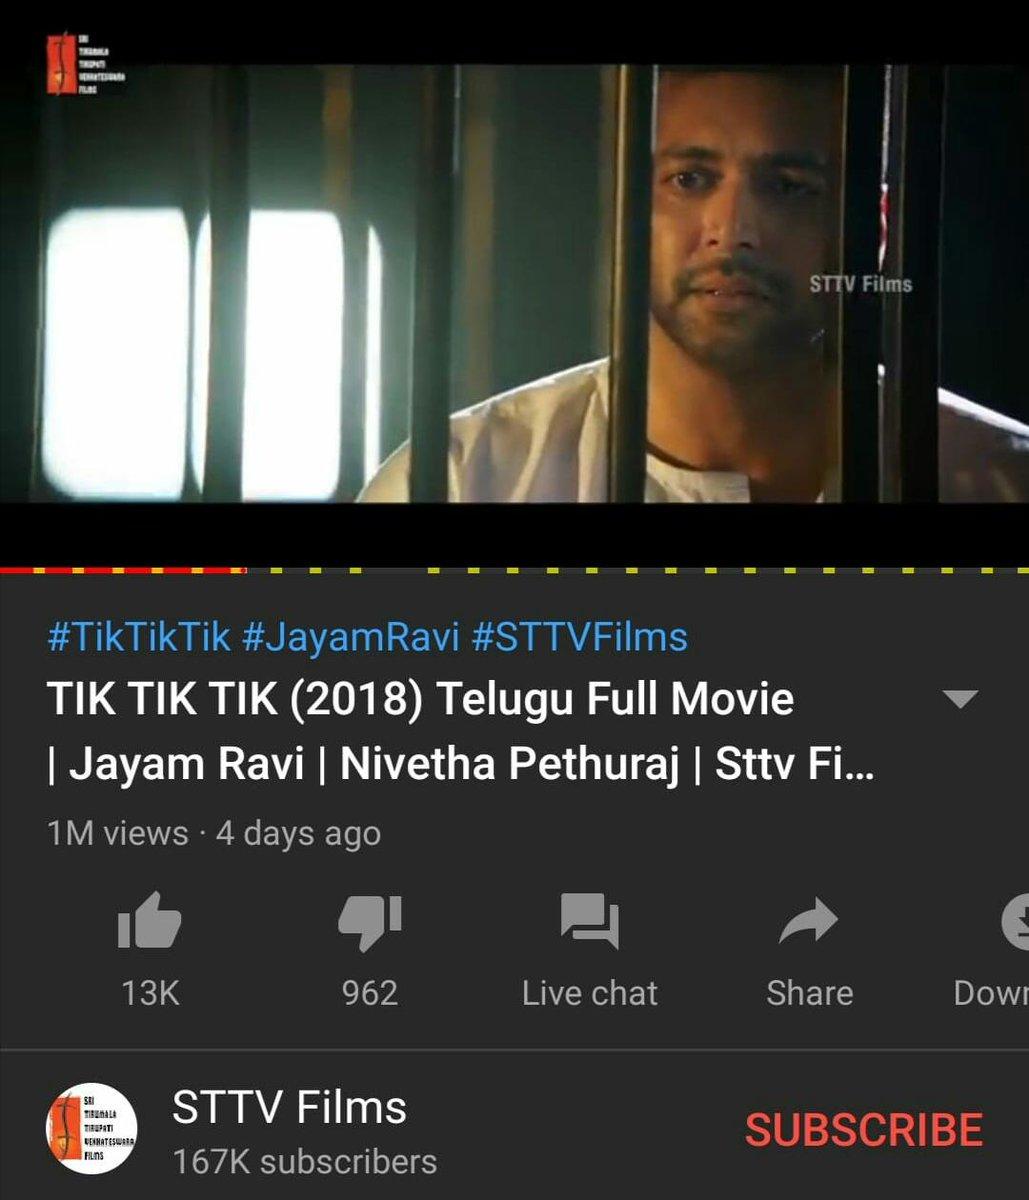 #TikTikTik - Telugu version receiving massive response among telugu audience too, It has crossed 1 Million views in less than 4 day of it's release on @YouTube 👏  @actor_jayamravi @ShaktiRajan @Nivetha_Tweets @JabaksMovies @immancomposer @madhankarky @SonyMusicSouth @proyuvraaj https://t.co/JilouoBaew